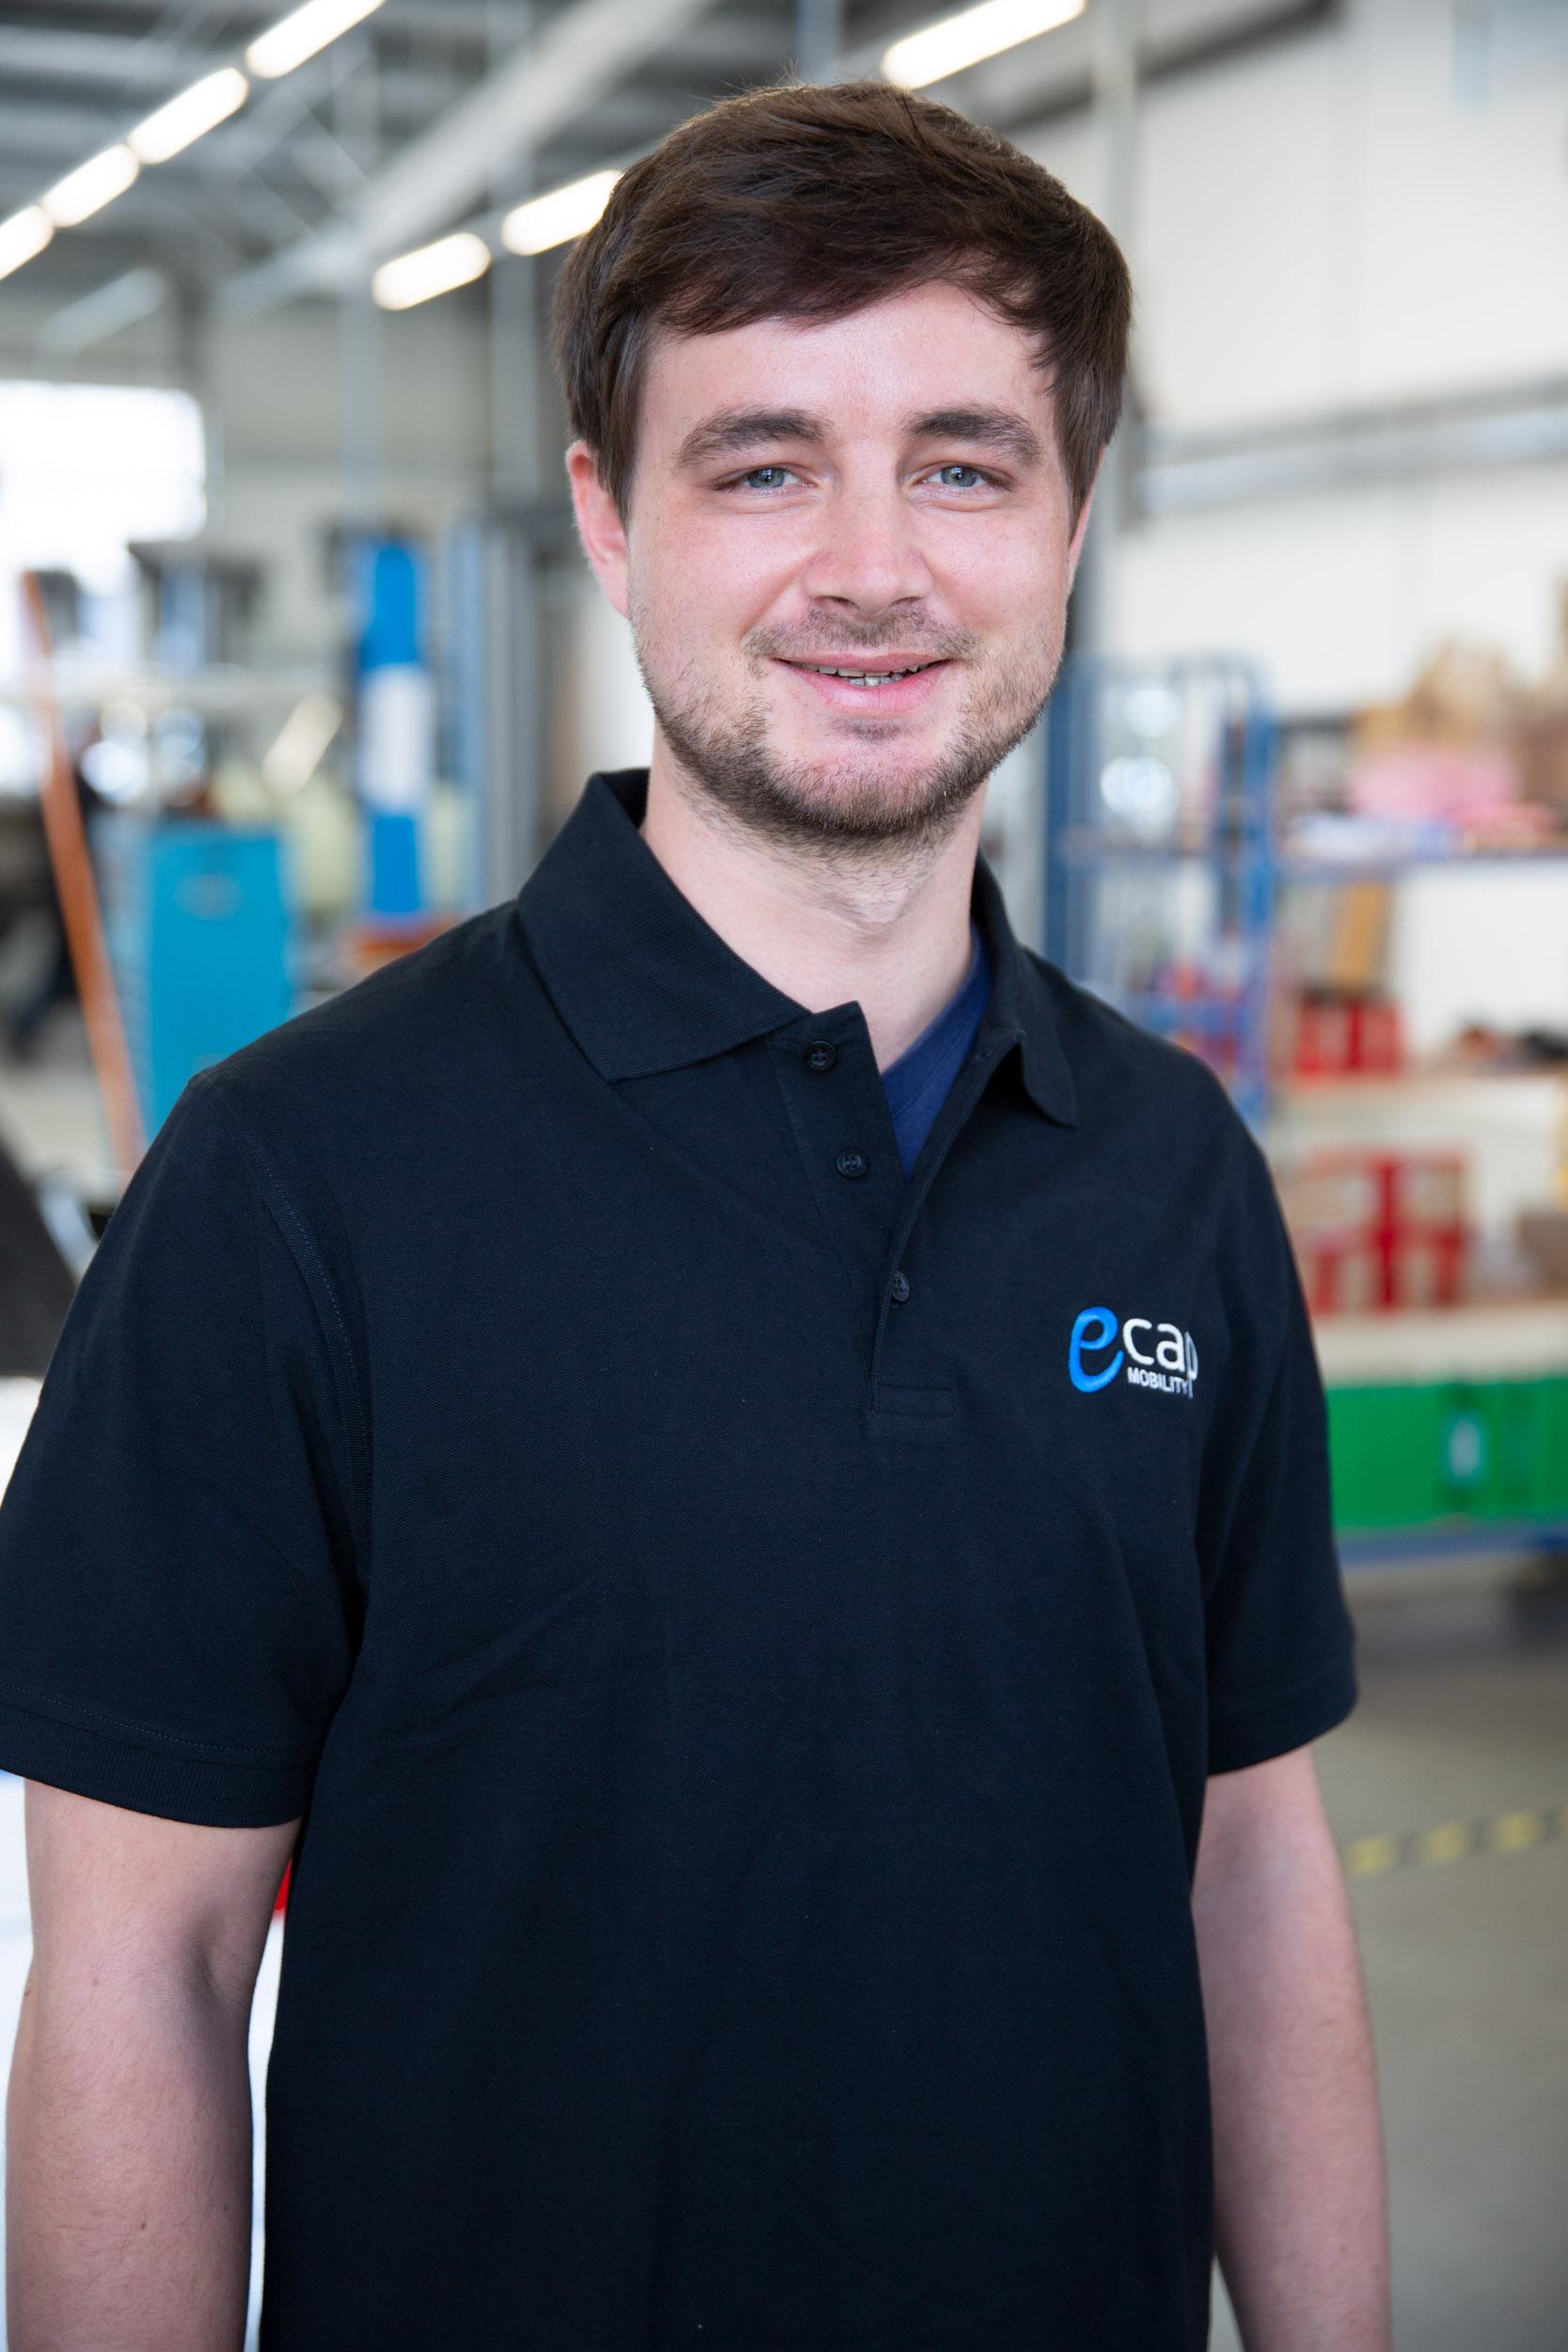 David Hotzel | Master Mechanic dho@ecap-mobility.com